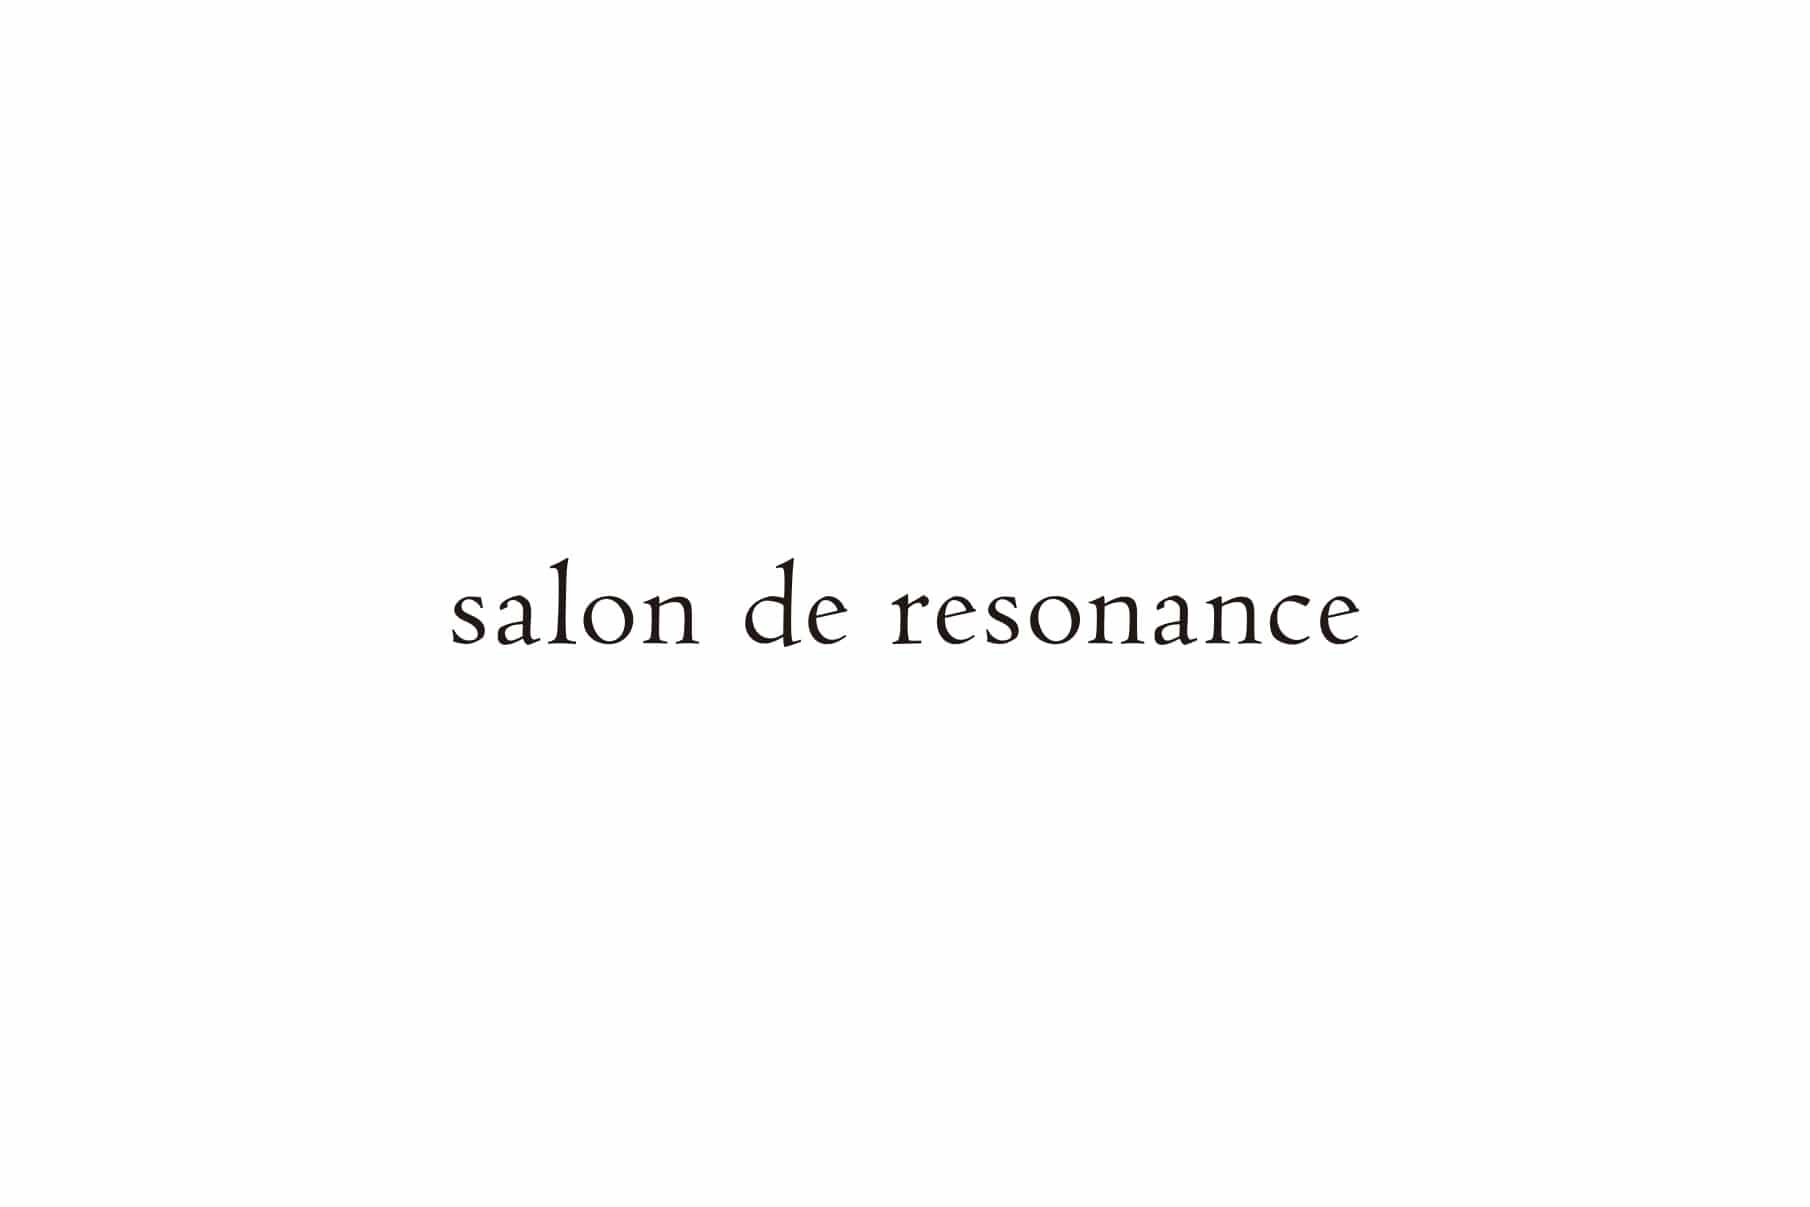 salon de resonance - Website 2